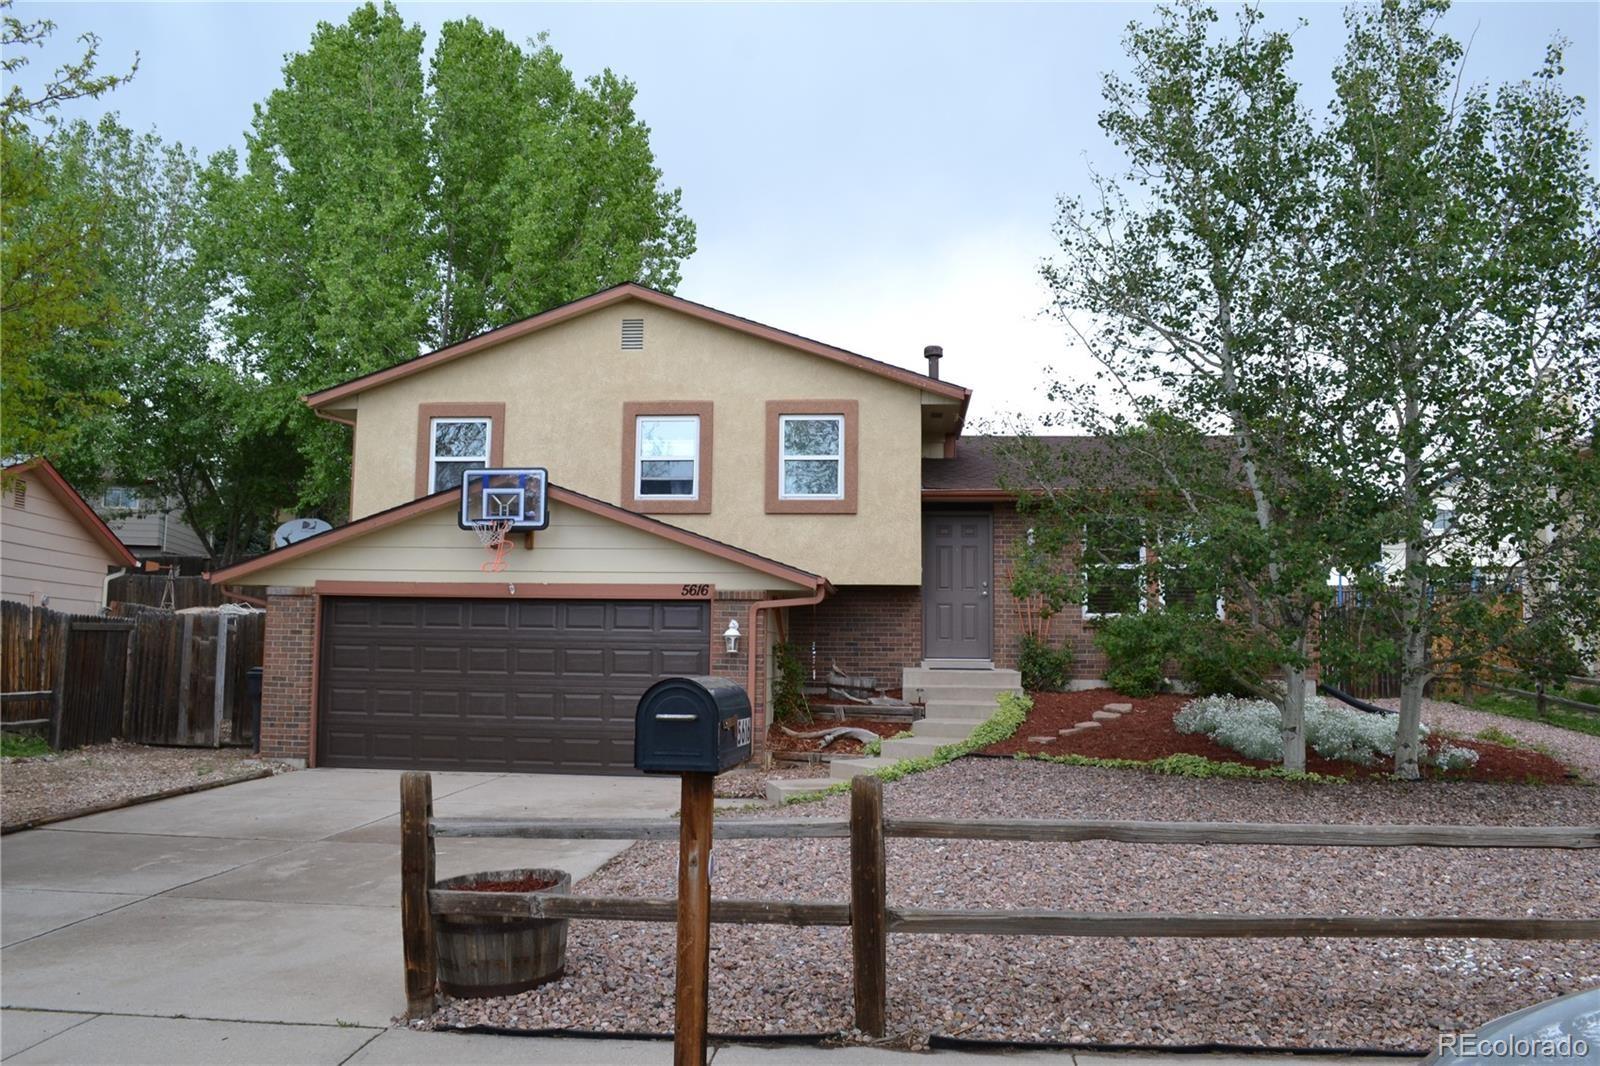 MLS# 4486712 - 2 - 5616 Trout Creek Pass Drive, Colorado Springs, CO 80917